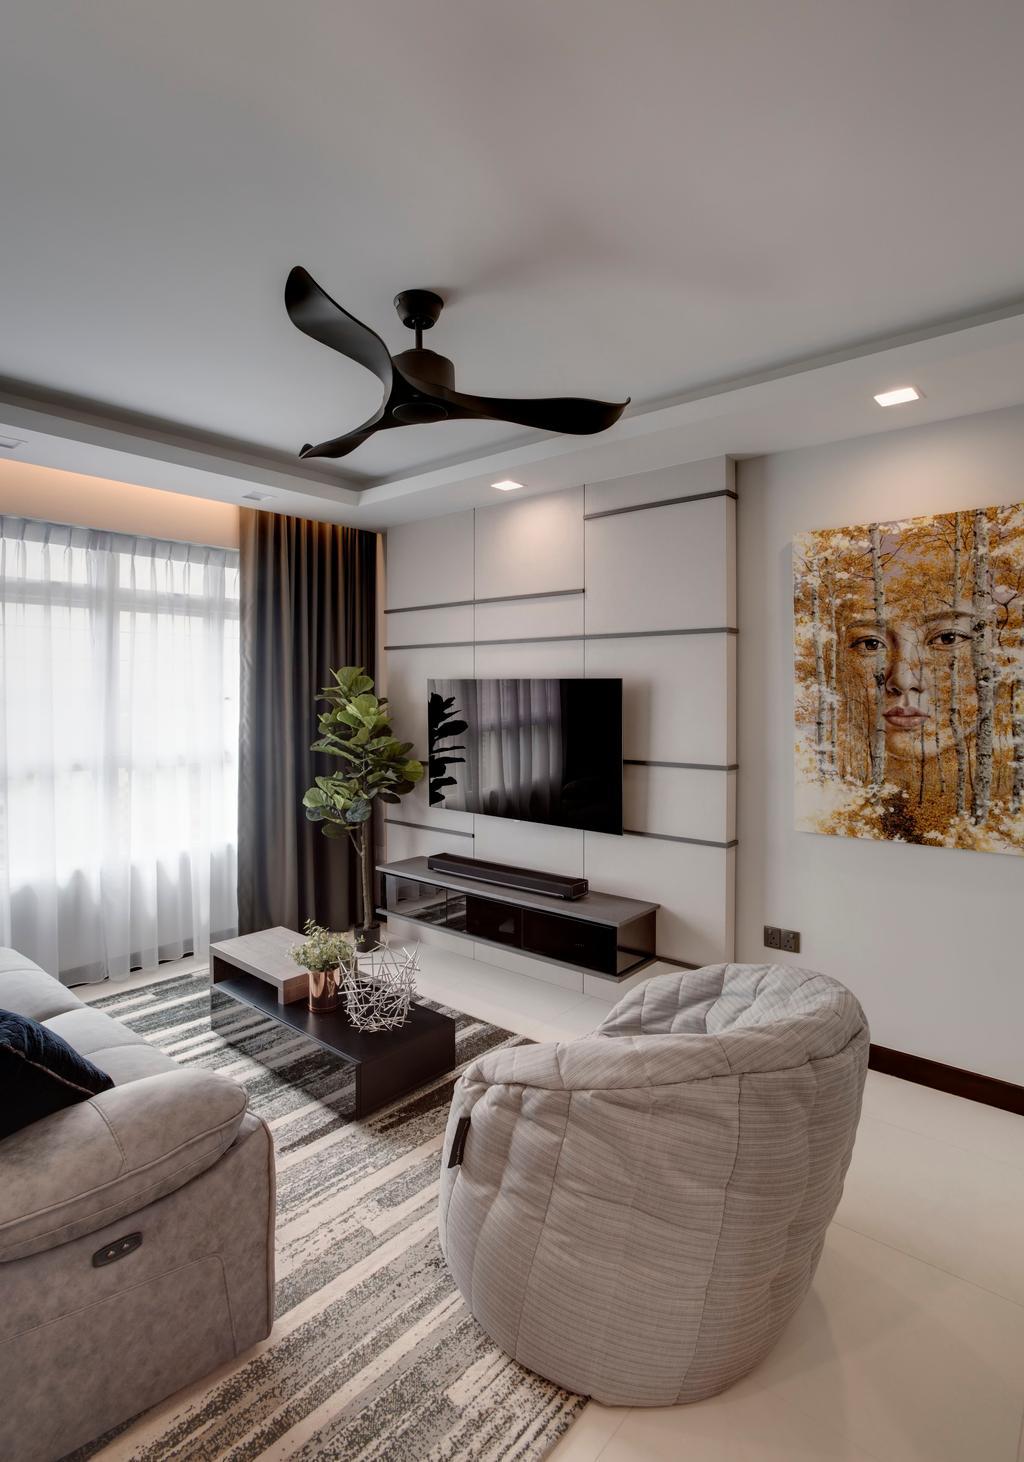 Modern, HDB, Living Room, Whampoa Dew (House 1), Interior Designer, Juz Interior, Flora, Jar, Plant, Potted Plant, Pottery, Vase, Couch, Furniture, Indoors, Room